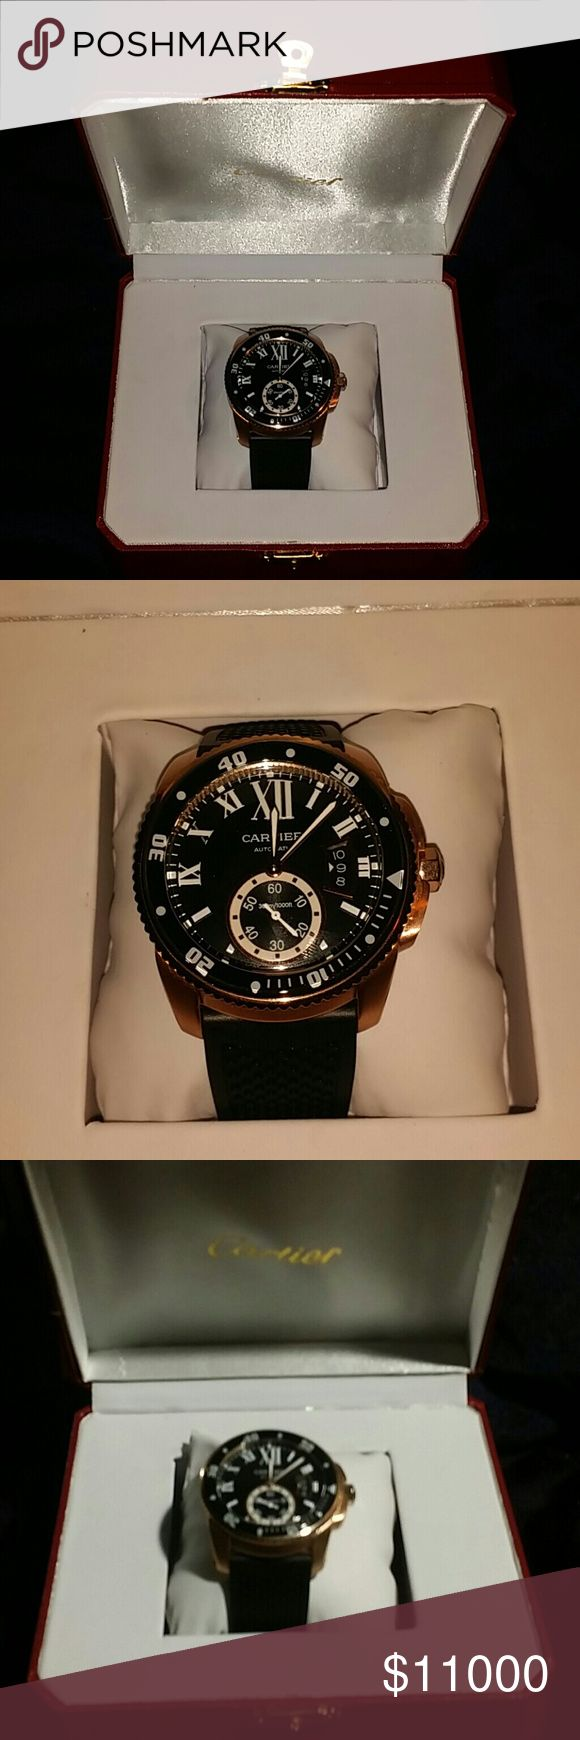 Mens Cartier watch Mens calibre De cartier diver 42mm automatic Rosewood gold  In original box Cartier Accessories Watches